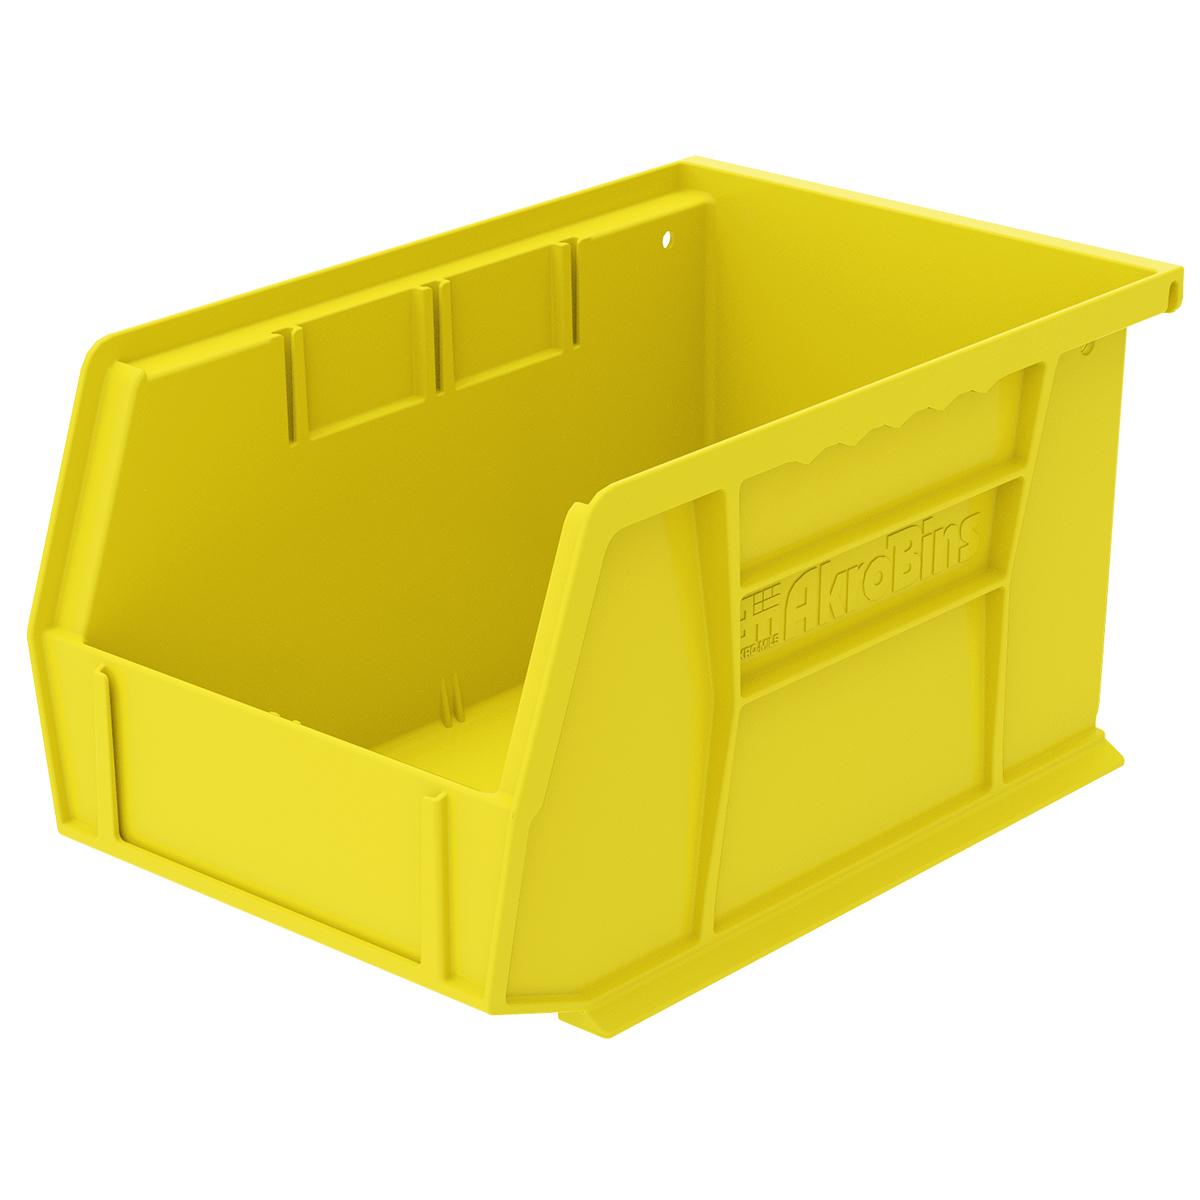 "9-1/4""L x 6""W x 5""H OD Yellow Storage Bin"